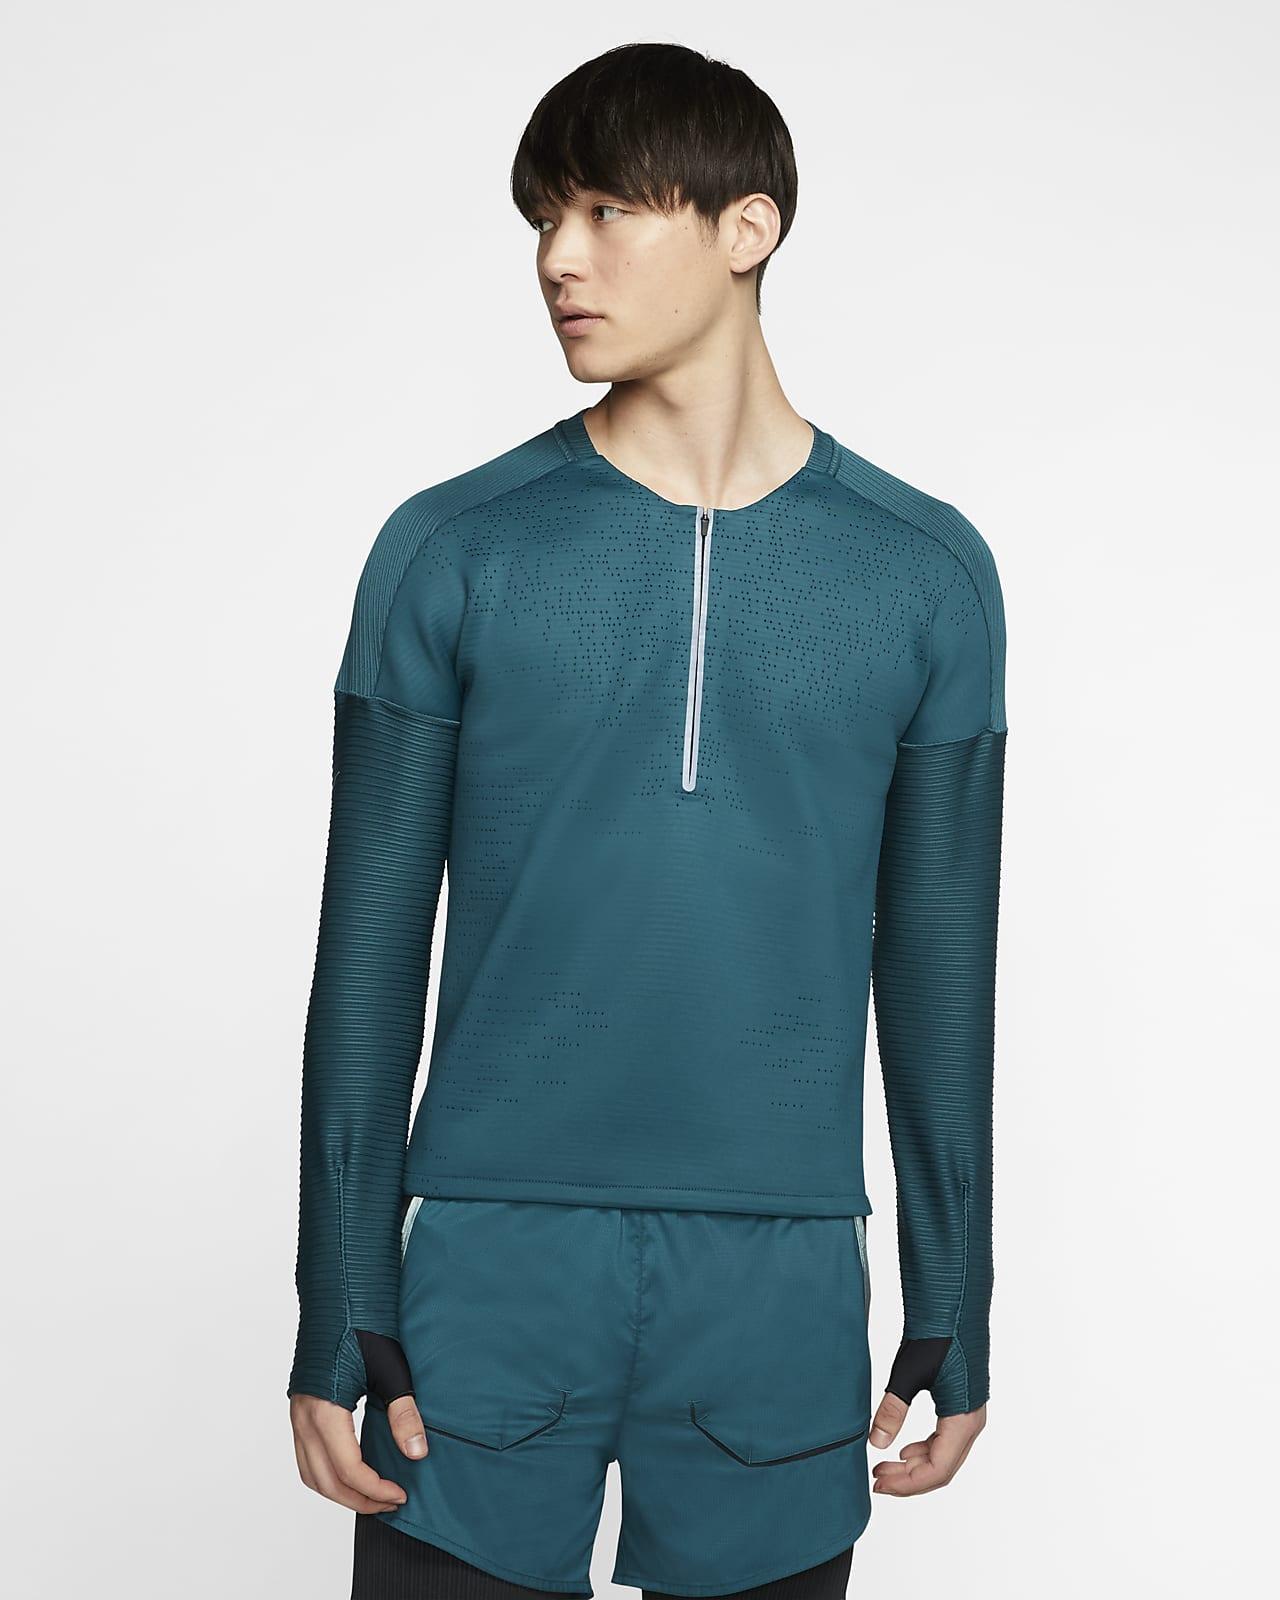 Nike Tech Pack Men's Long-Sleeve Running Top